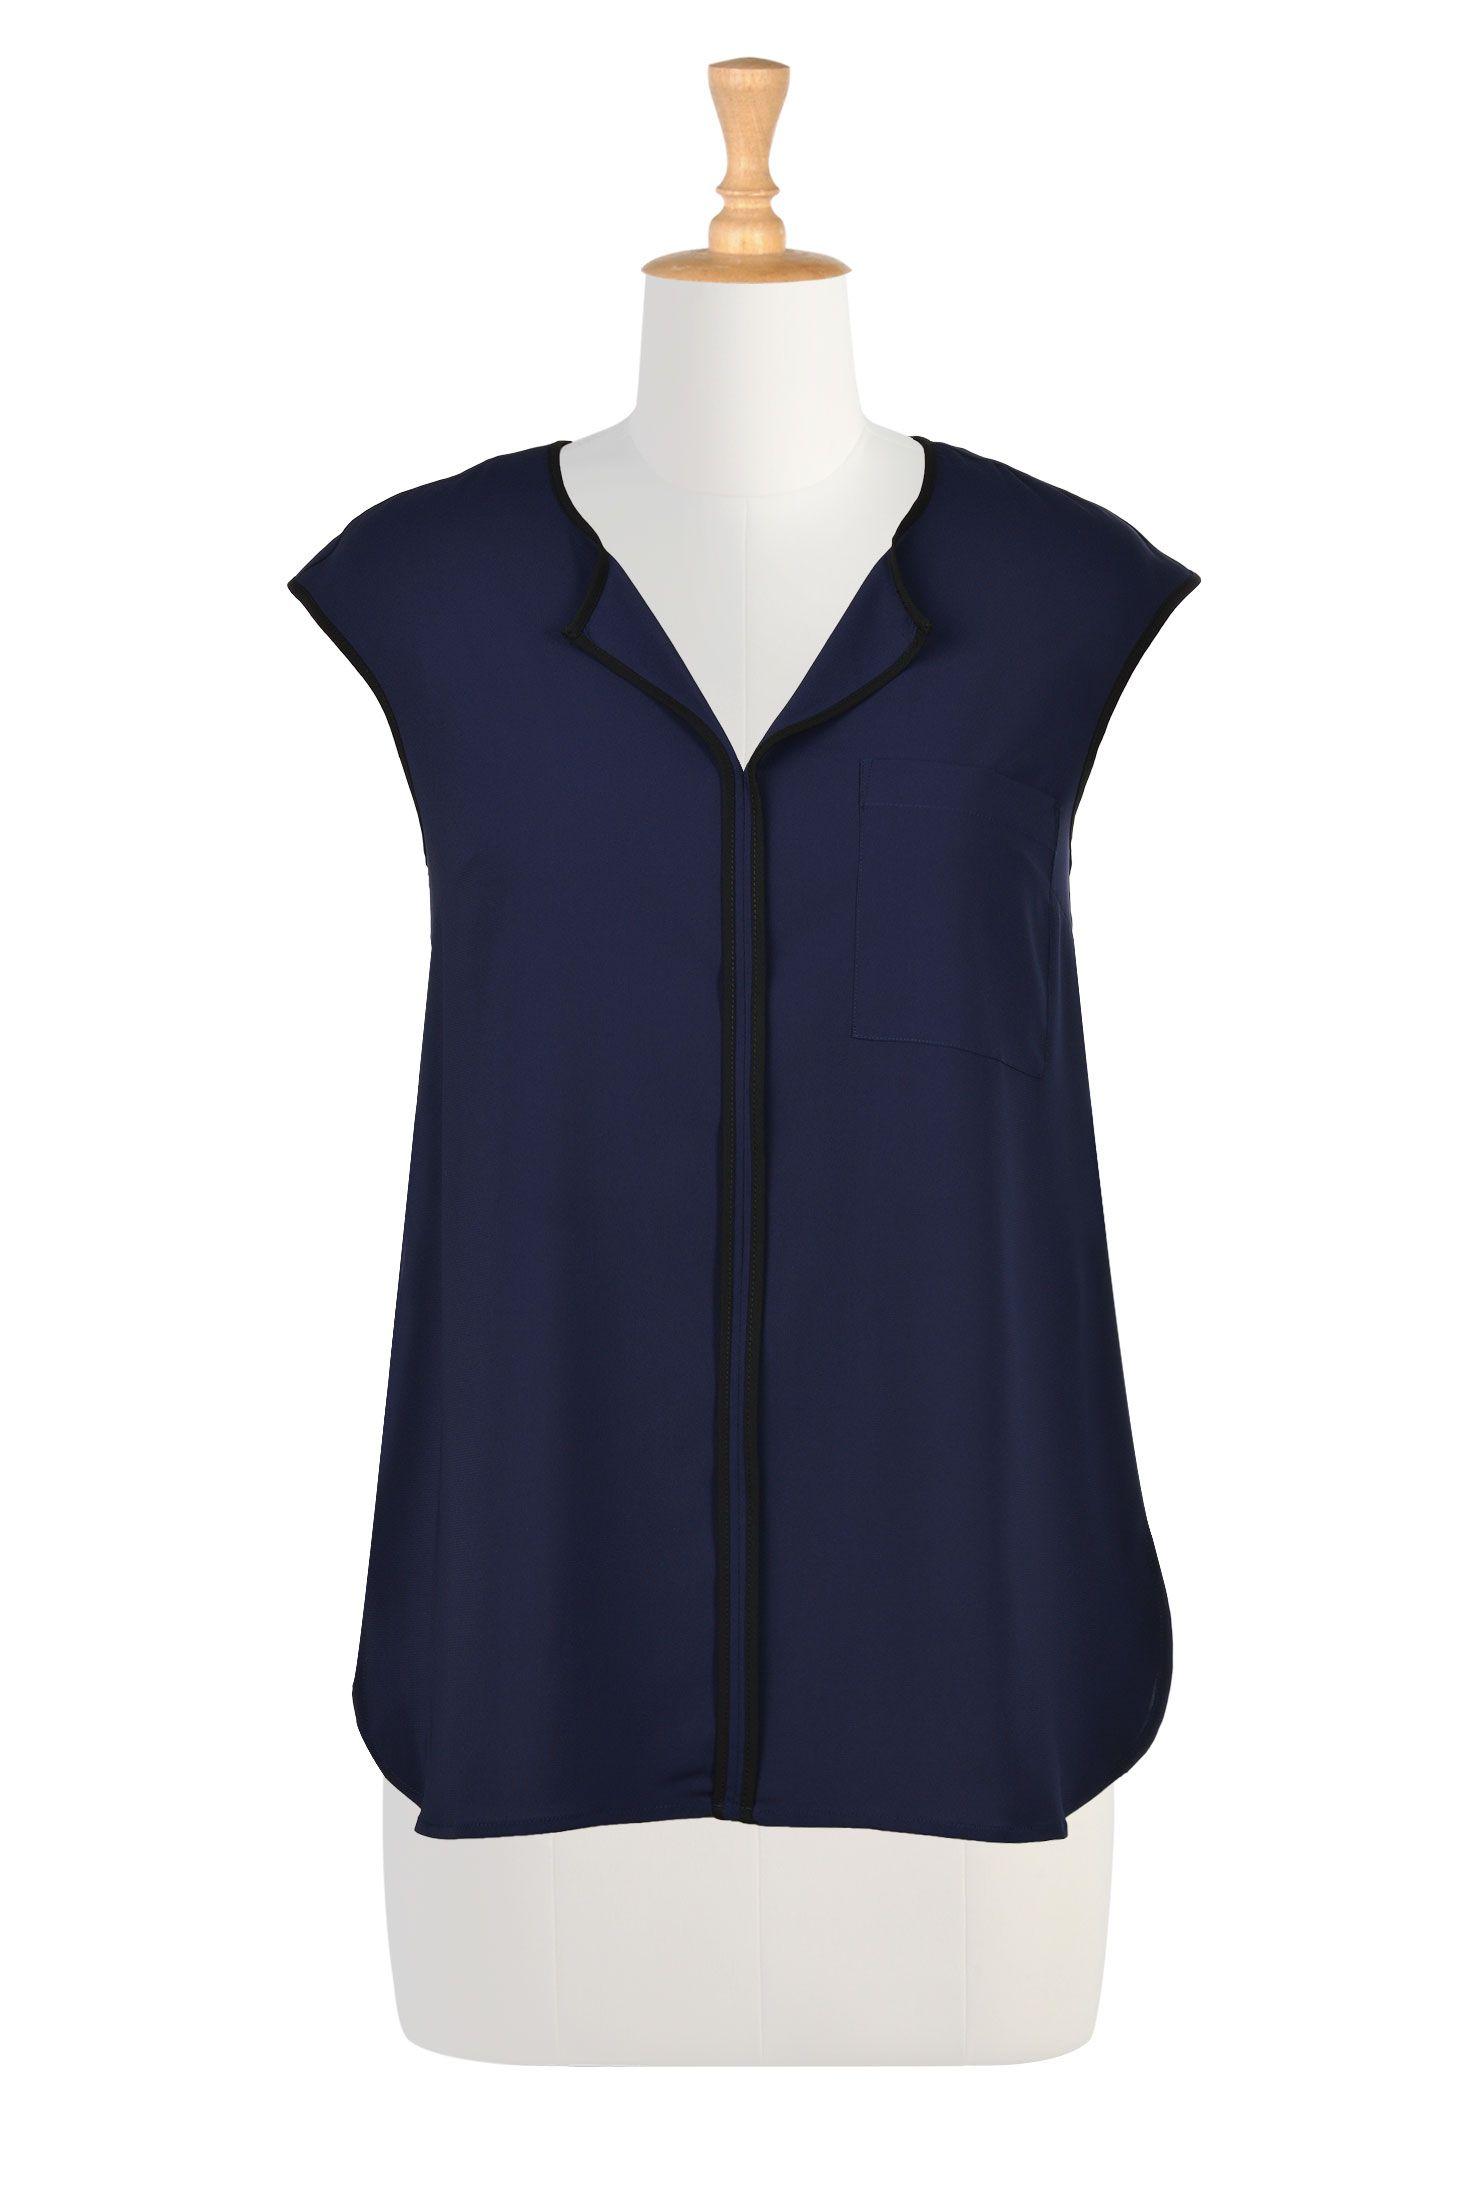 Notch Neck Contrast Trim Crepe Blouses, Polyester Crepe Cap Sleeve Tops Shop womens fashion clothing - Trendy Women's Tops - Shop for Fashion, Missy, Plus, Petite, Tall, 1X, 2X, 3X, 4X, 5X, 6X, Custom - CL0035096 | eShakti